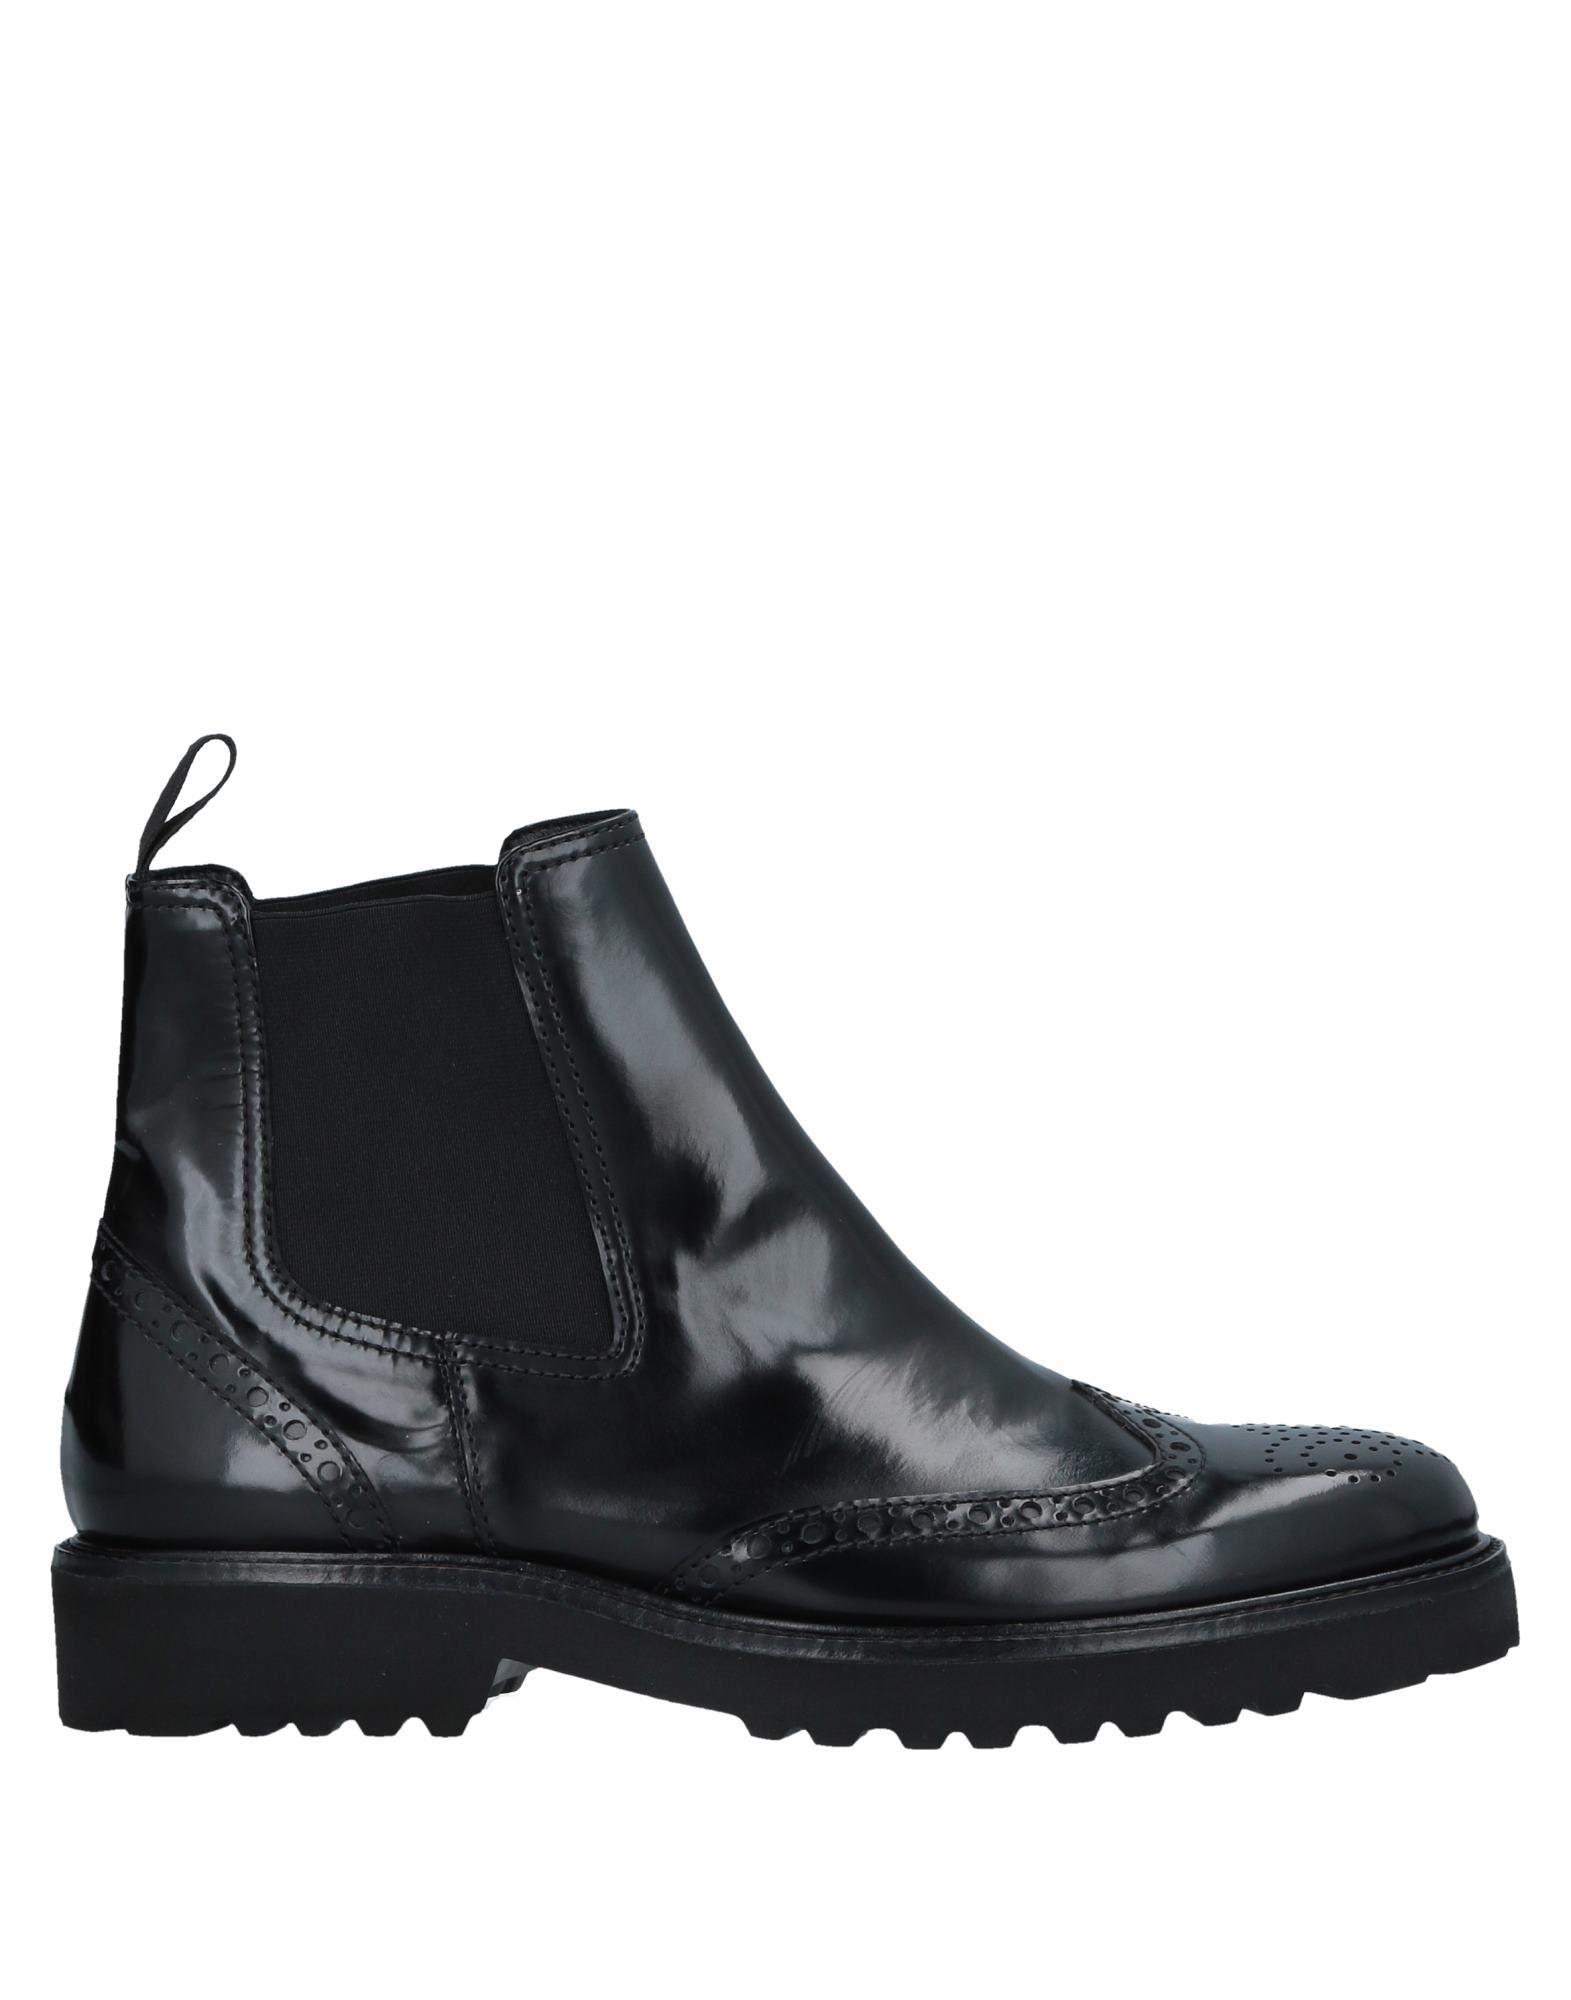 LA SELLERIE Полусапоги и высокие ботинки